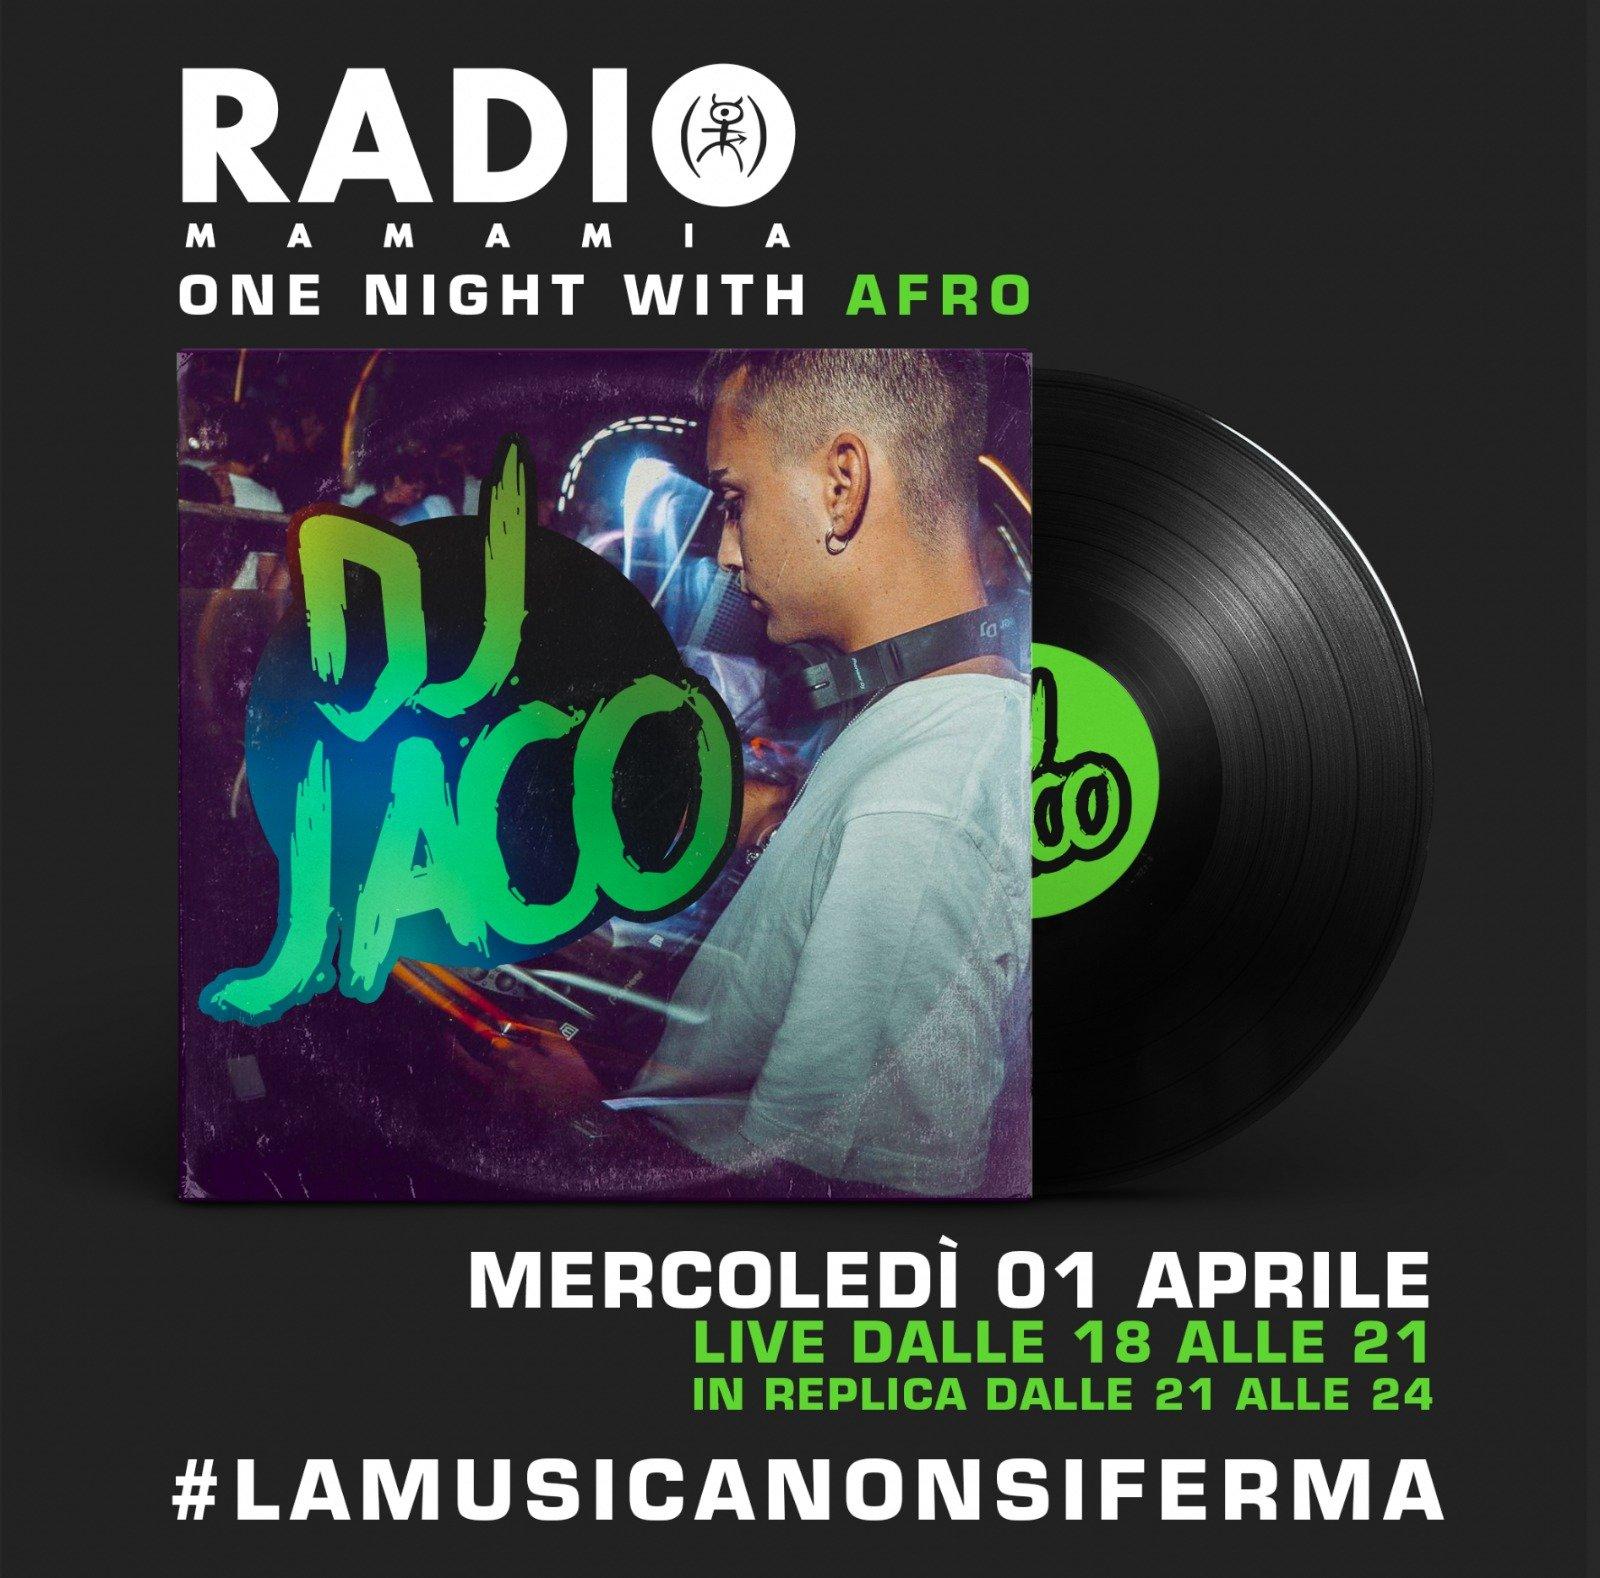 Jaco dj Radio Mamamia